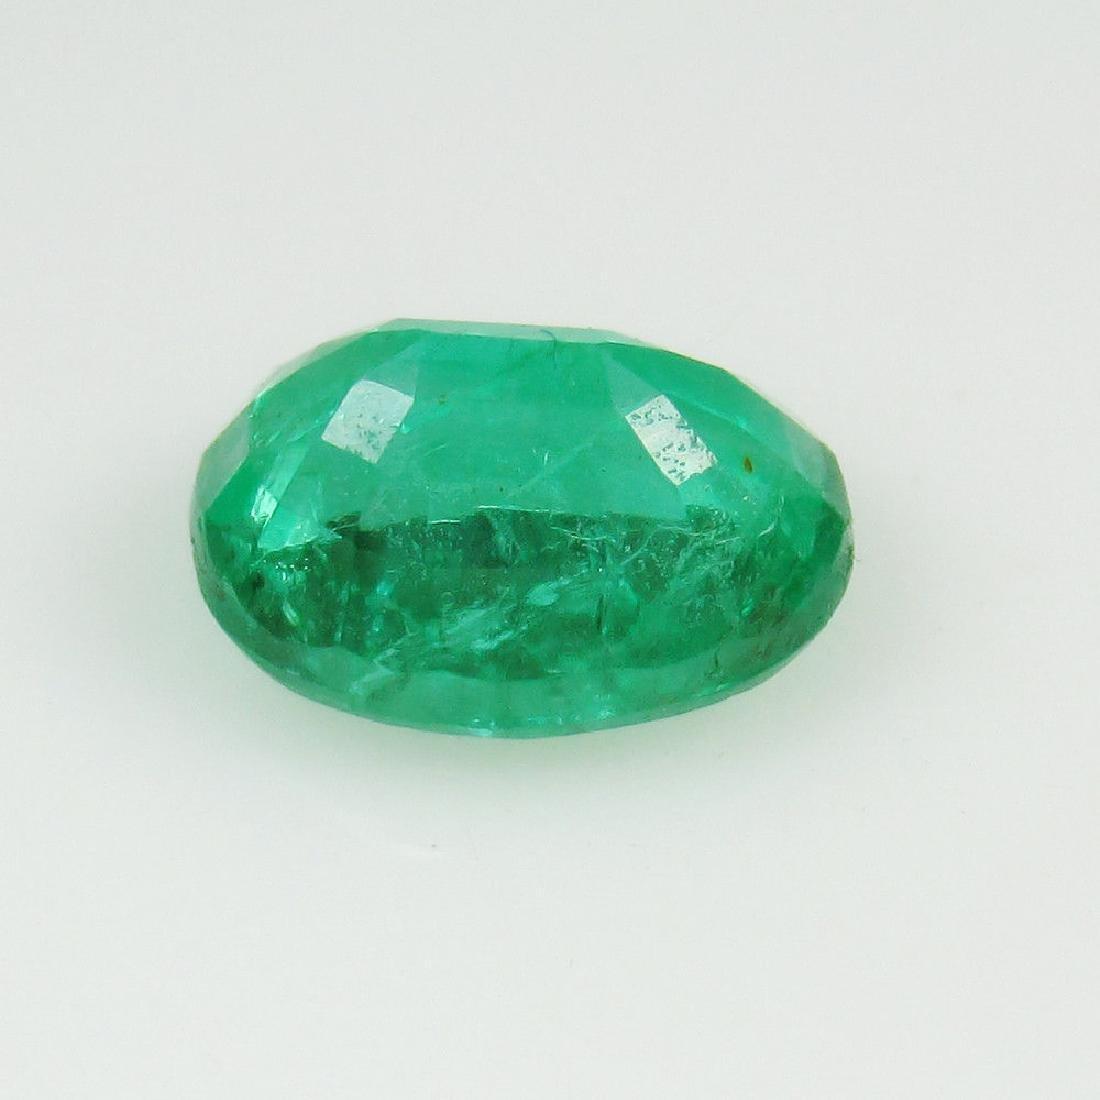 1.73 Ct Genuine Loose Zambian Emerald Nice Oval cut Top - 4